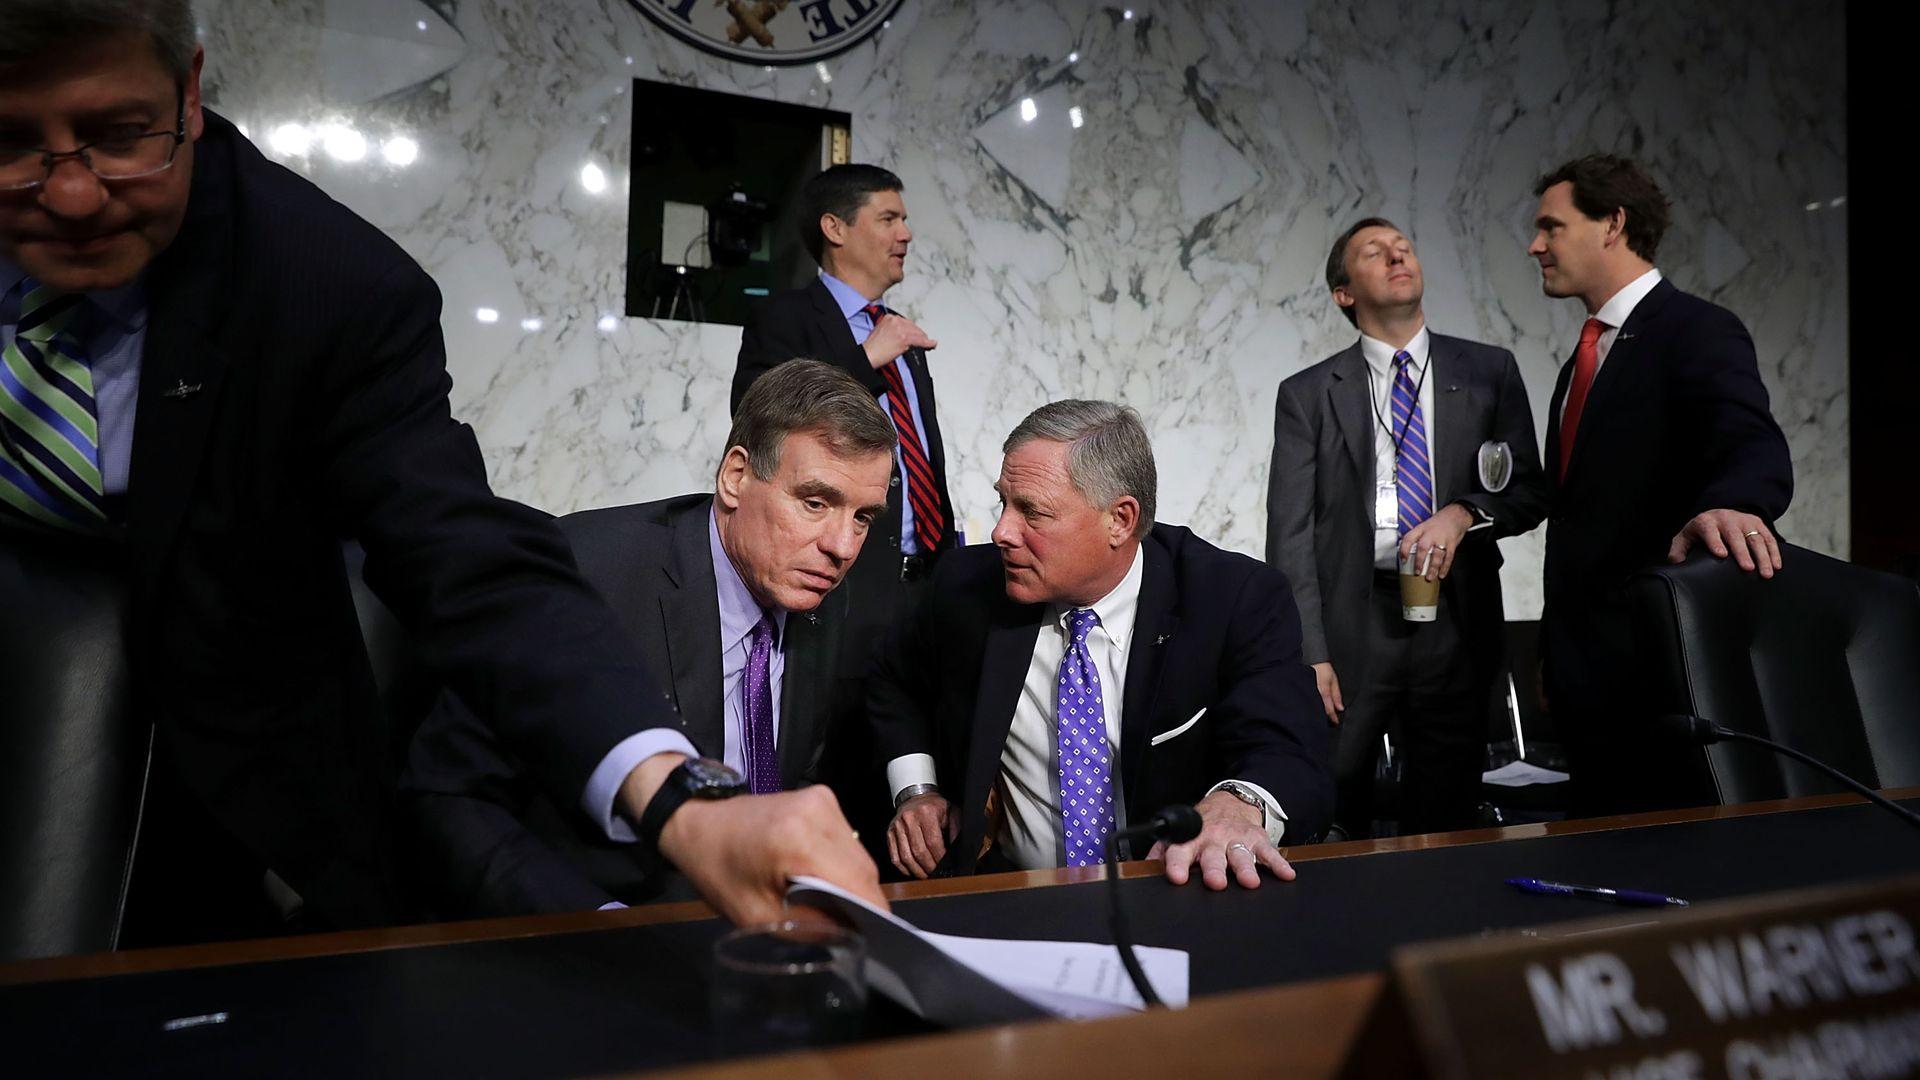 Senate Intelligence Committee Chairman Richard Burr (R-NC) talks with ranking member Sen. Mark Warner (D-VA). Photo: Chip Somodevilla/Getty Images